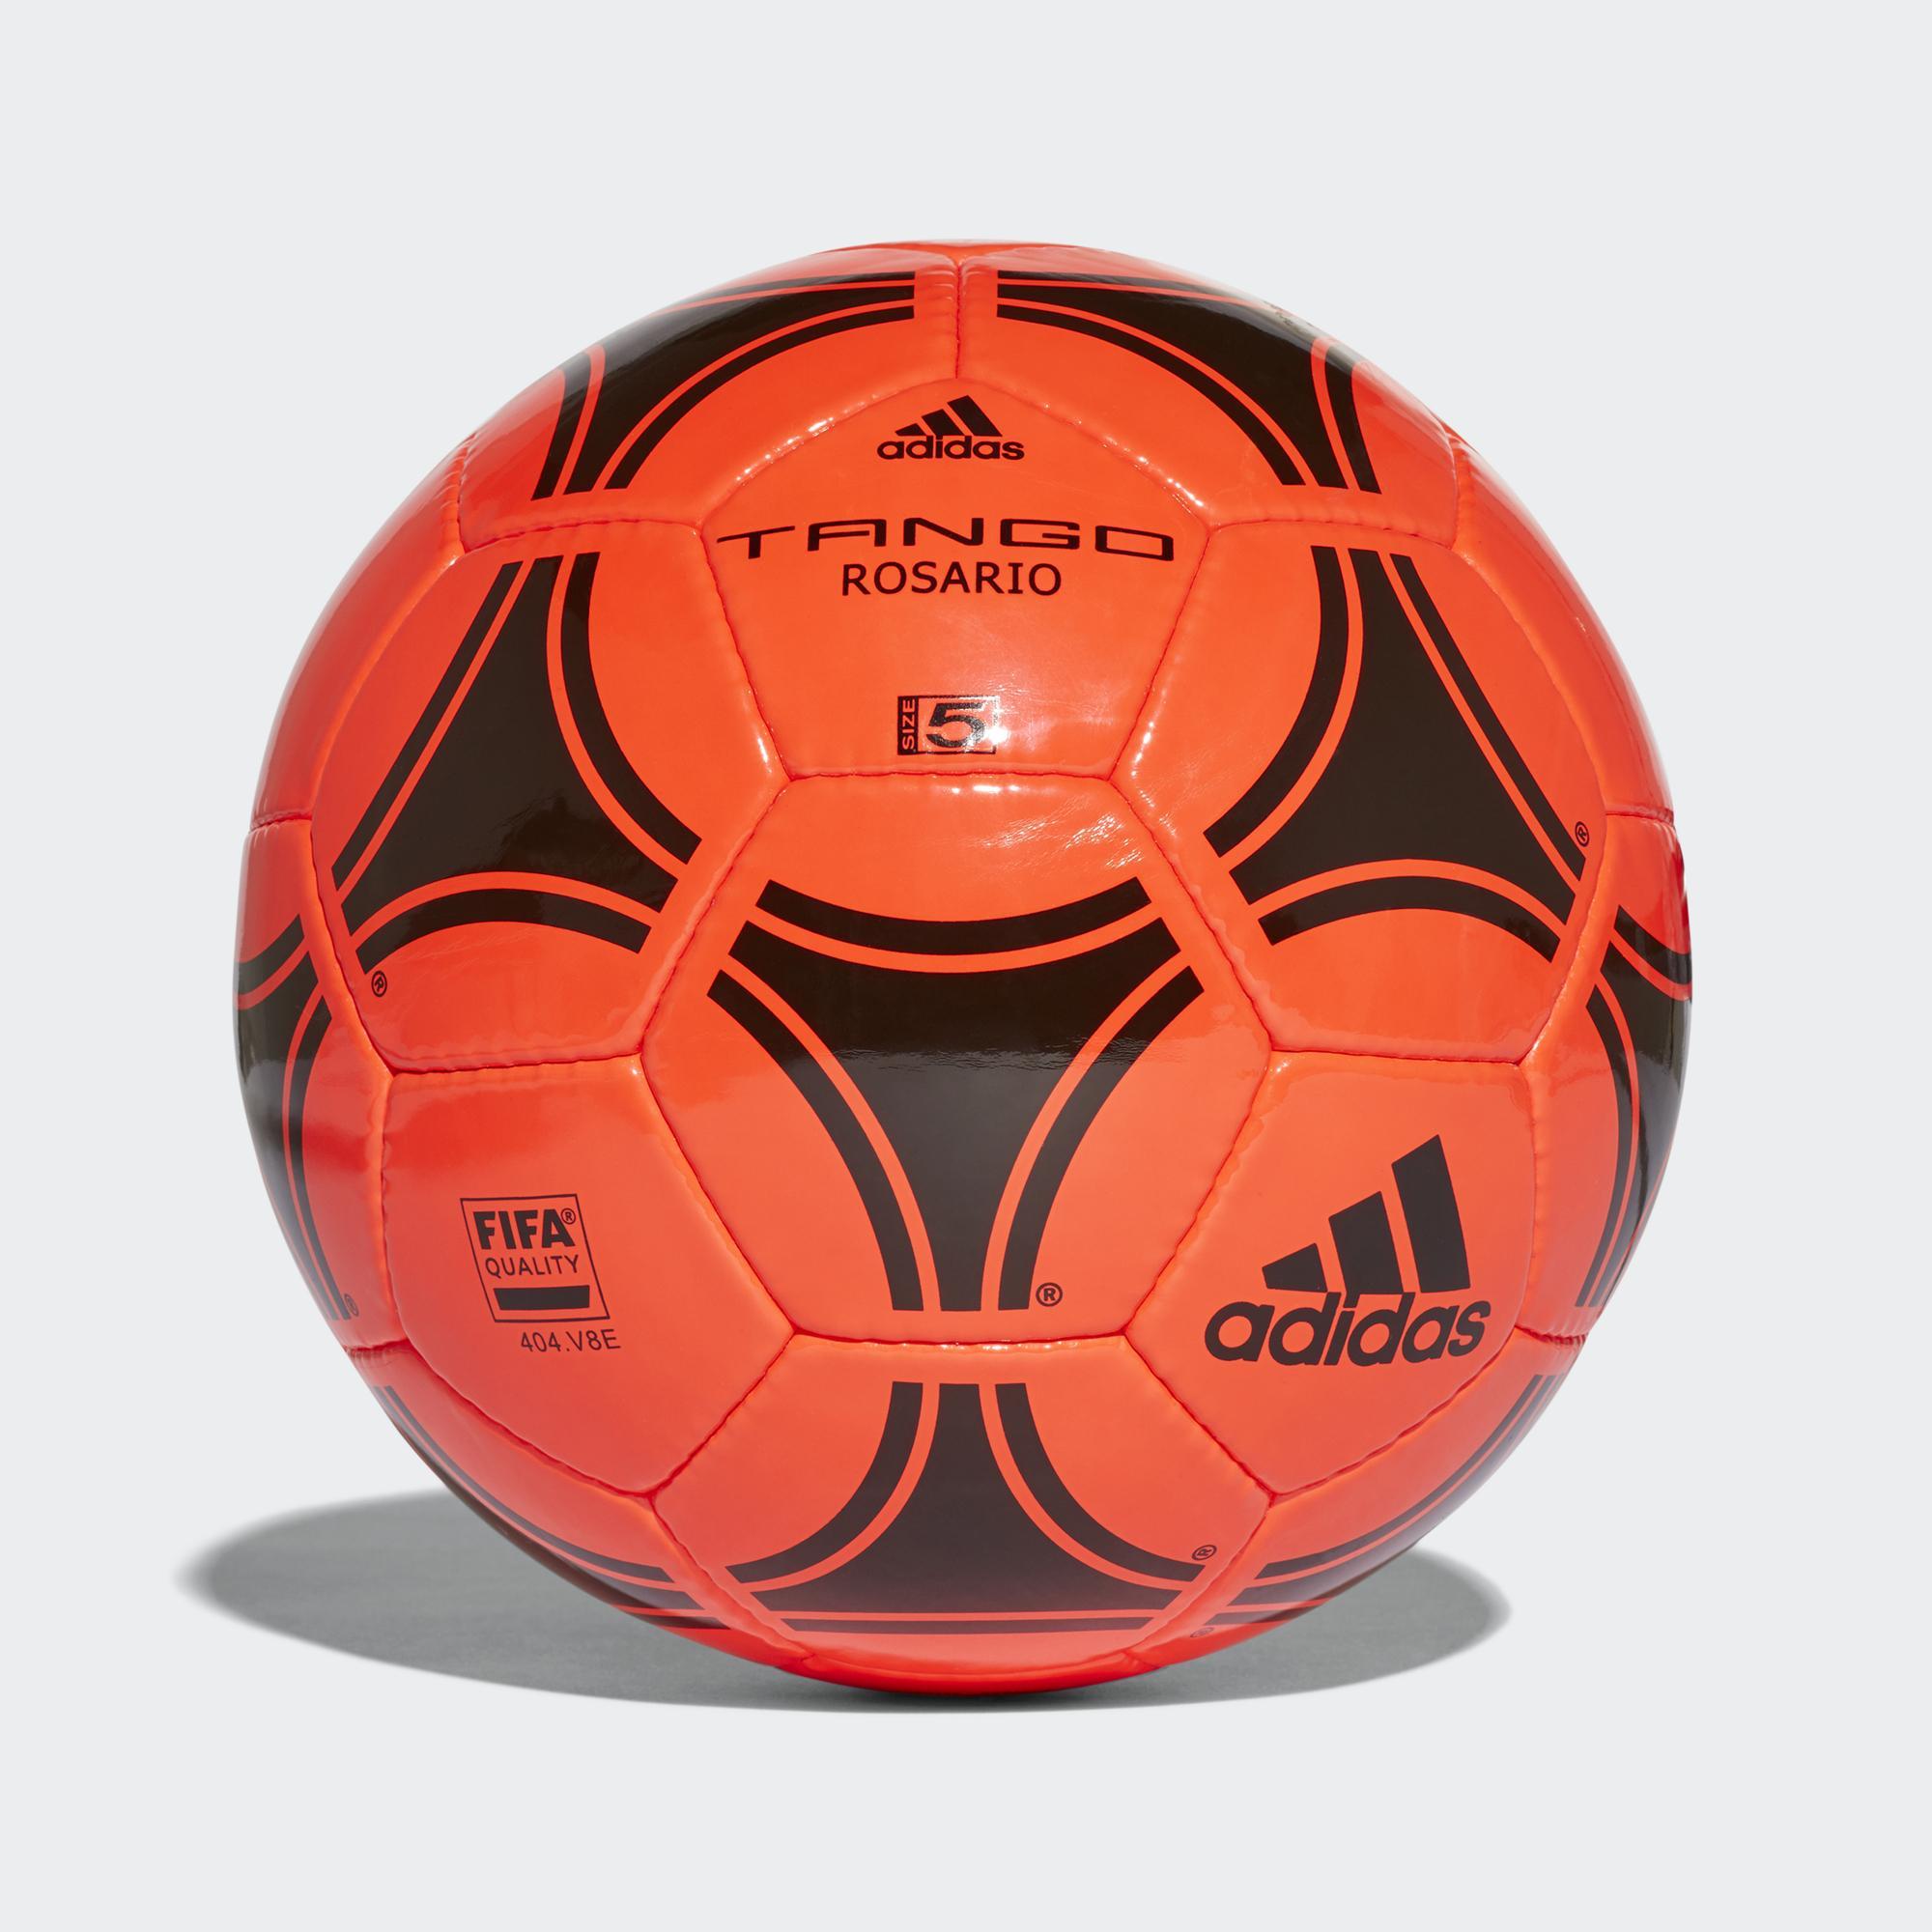 Adidas Pallone Tango Rosario